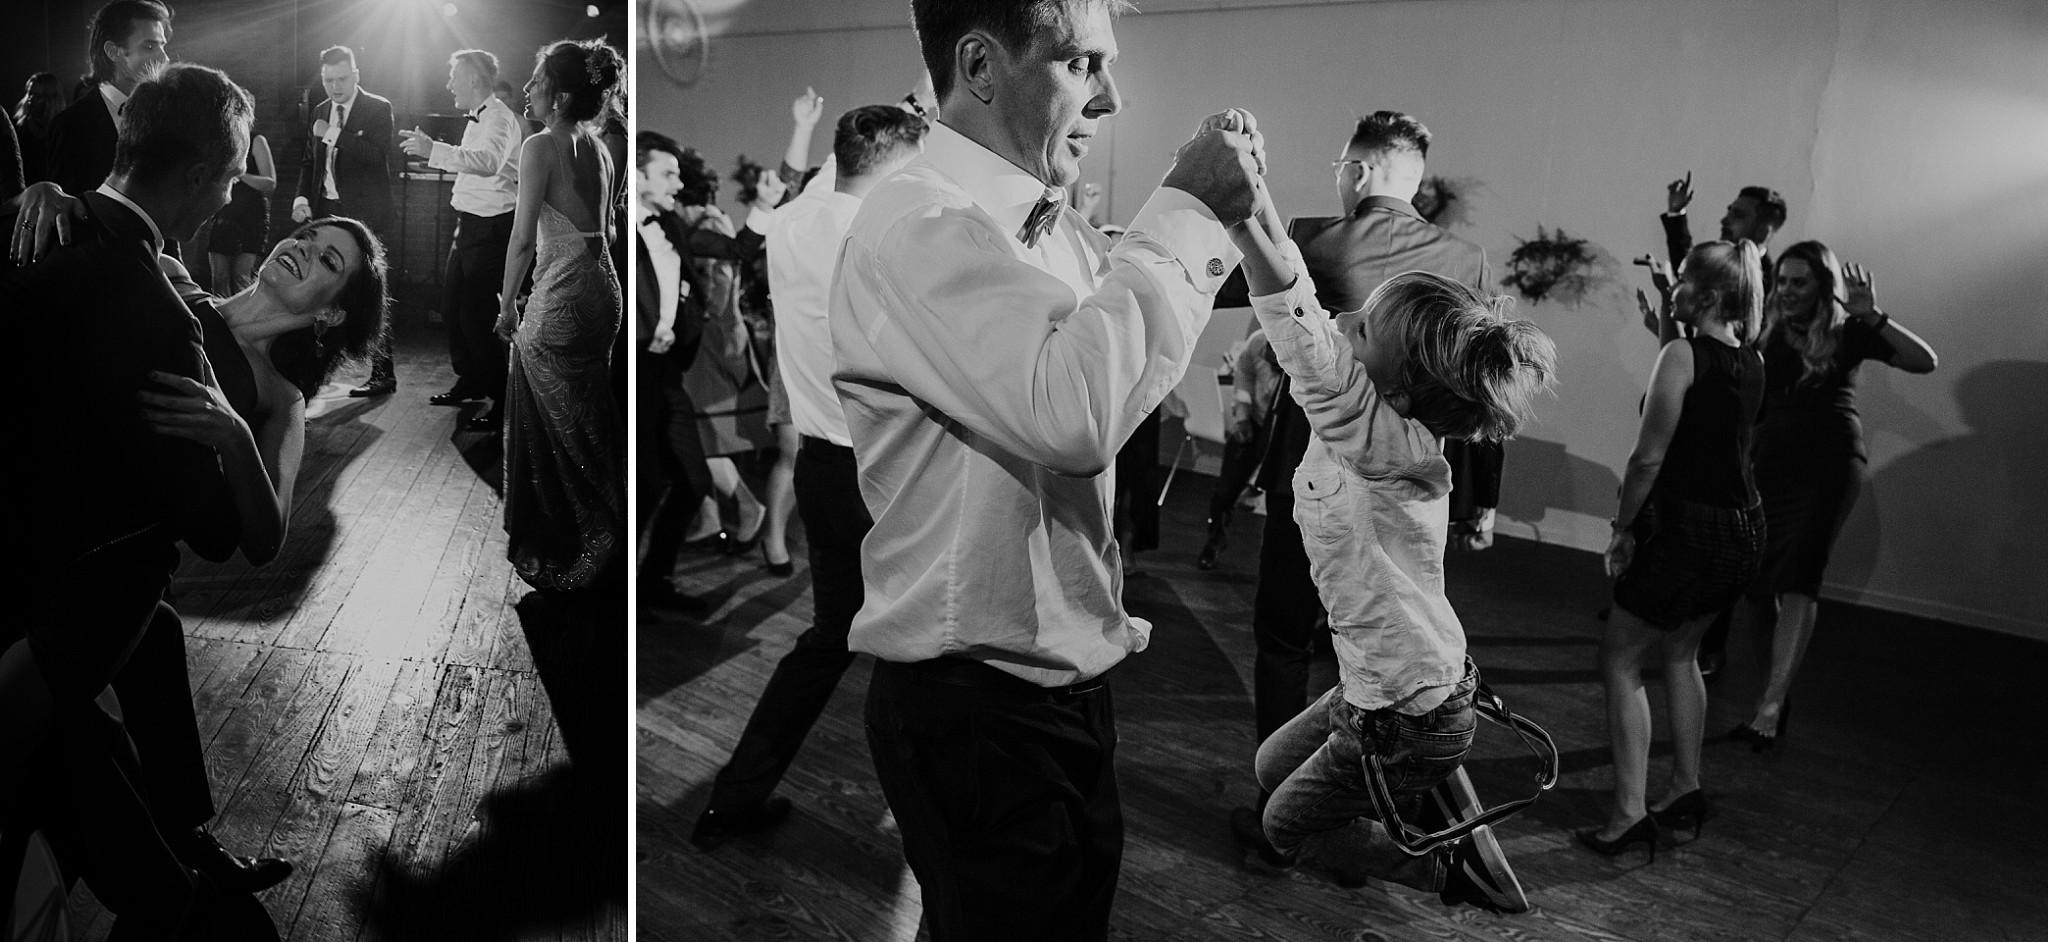 fotograf poznan wesele dobra truskawka piekne wesele pod poznaniem wesele w dobrej truskawce piekna para mloda slub marzen slub koronawirus slub listopad wesele koronawirus 413